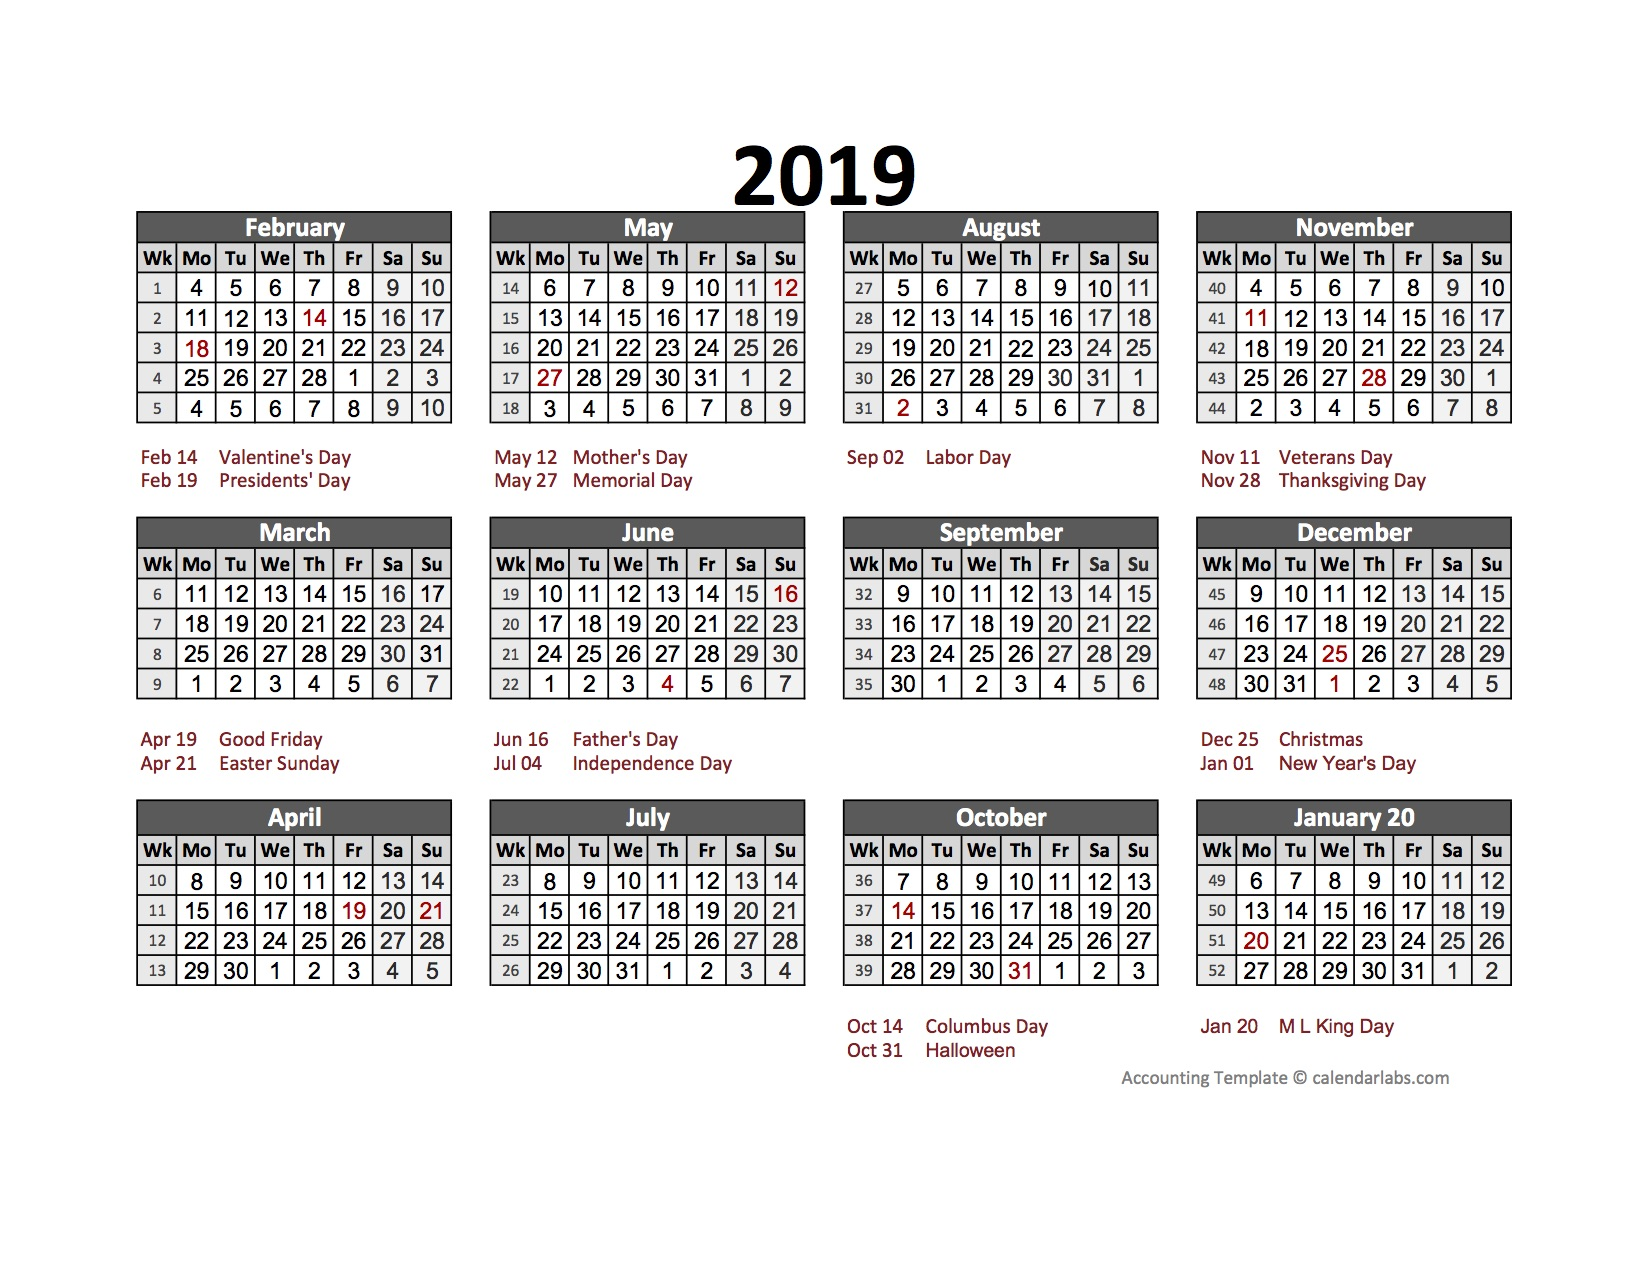 2019 Accounting Calendar 5-4-4 - Free Printable Templates